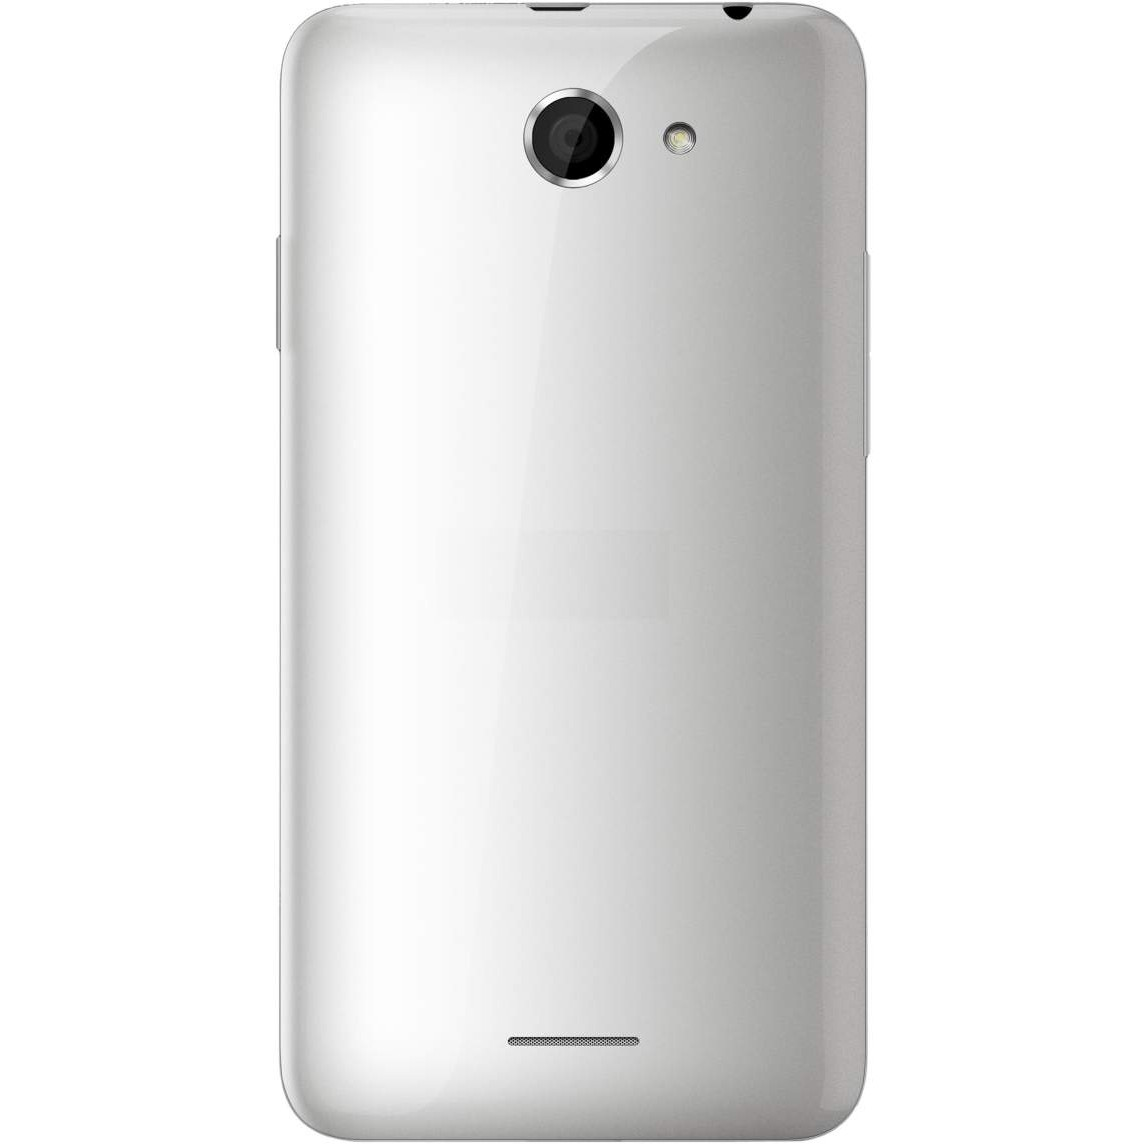 pretty nice bac7c 9d086 Full Body Housing for HTC Desire 516 - White